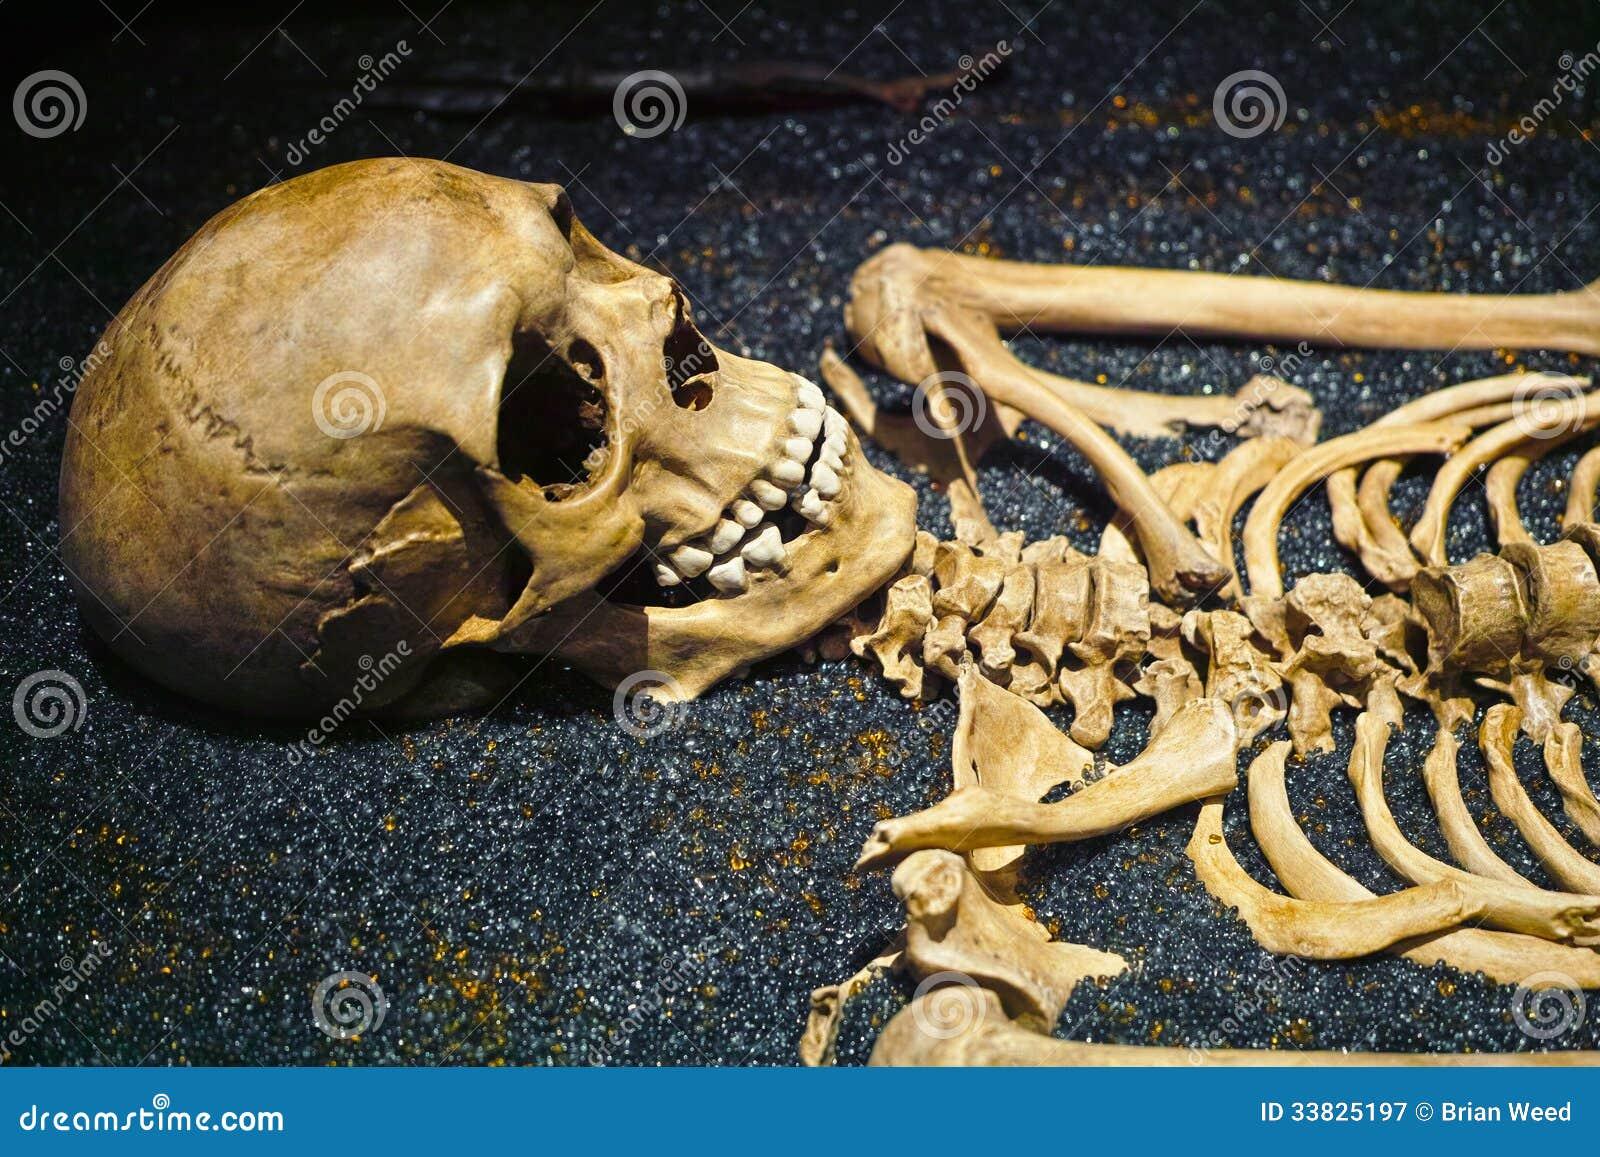 Human Skull and Skeleton Bones